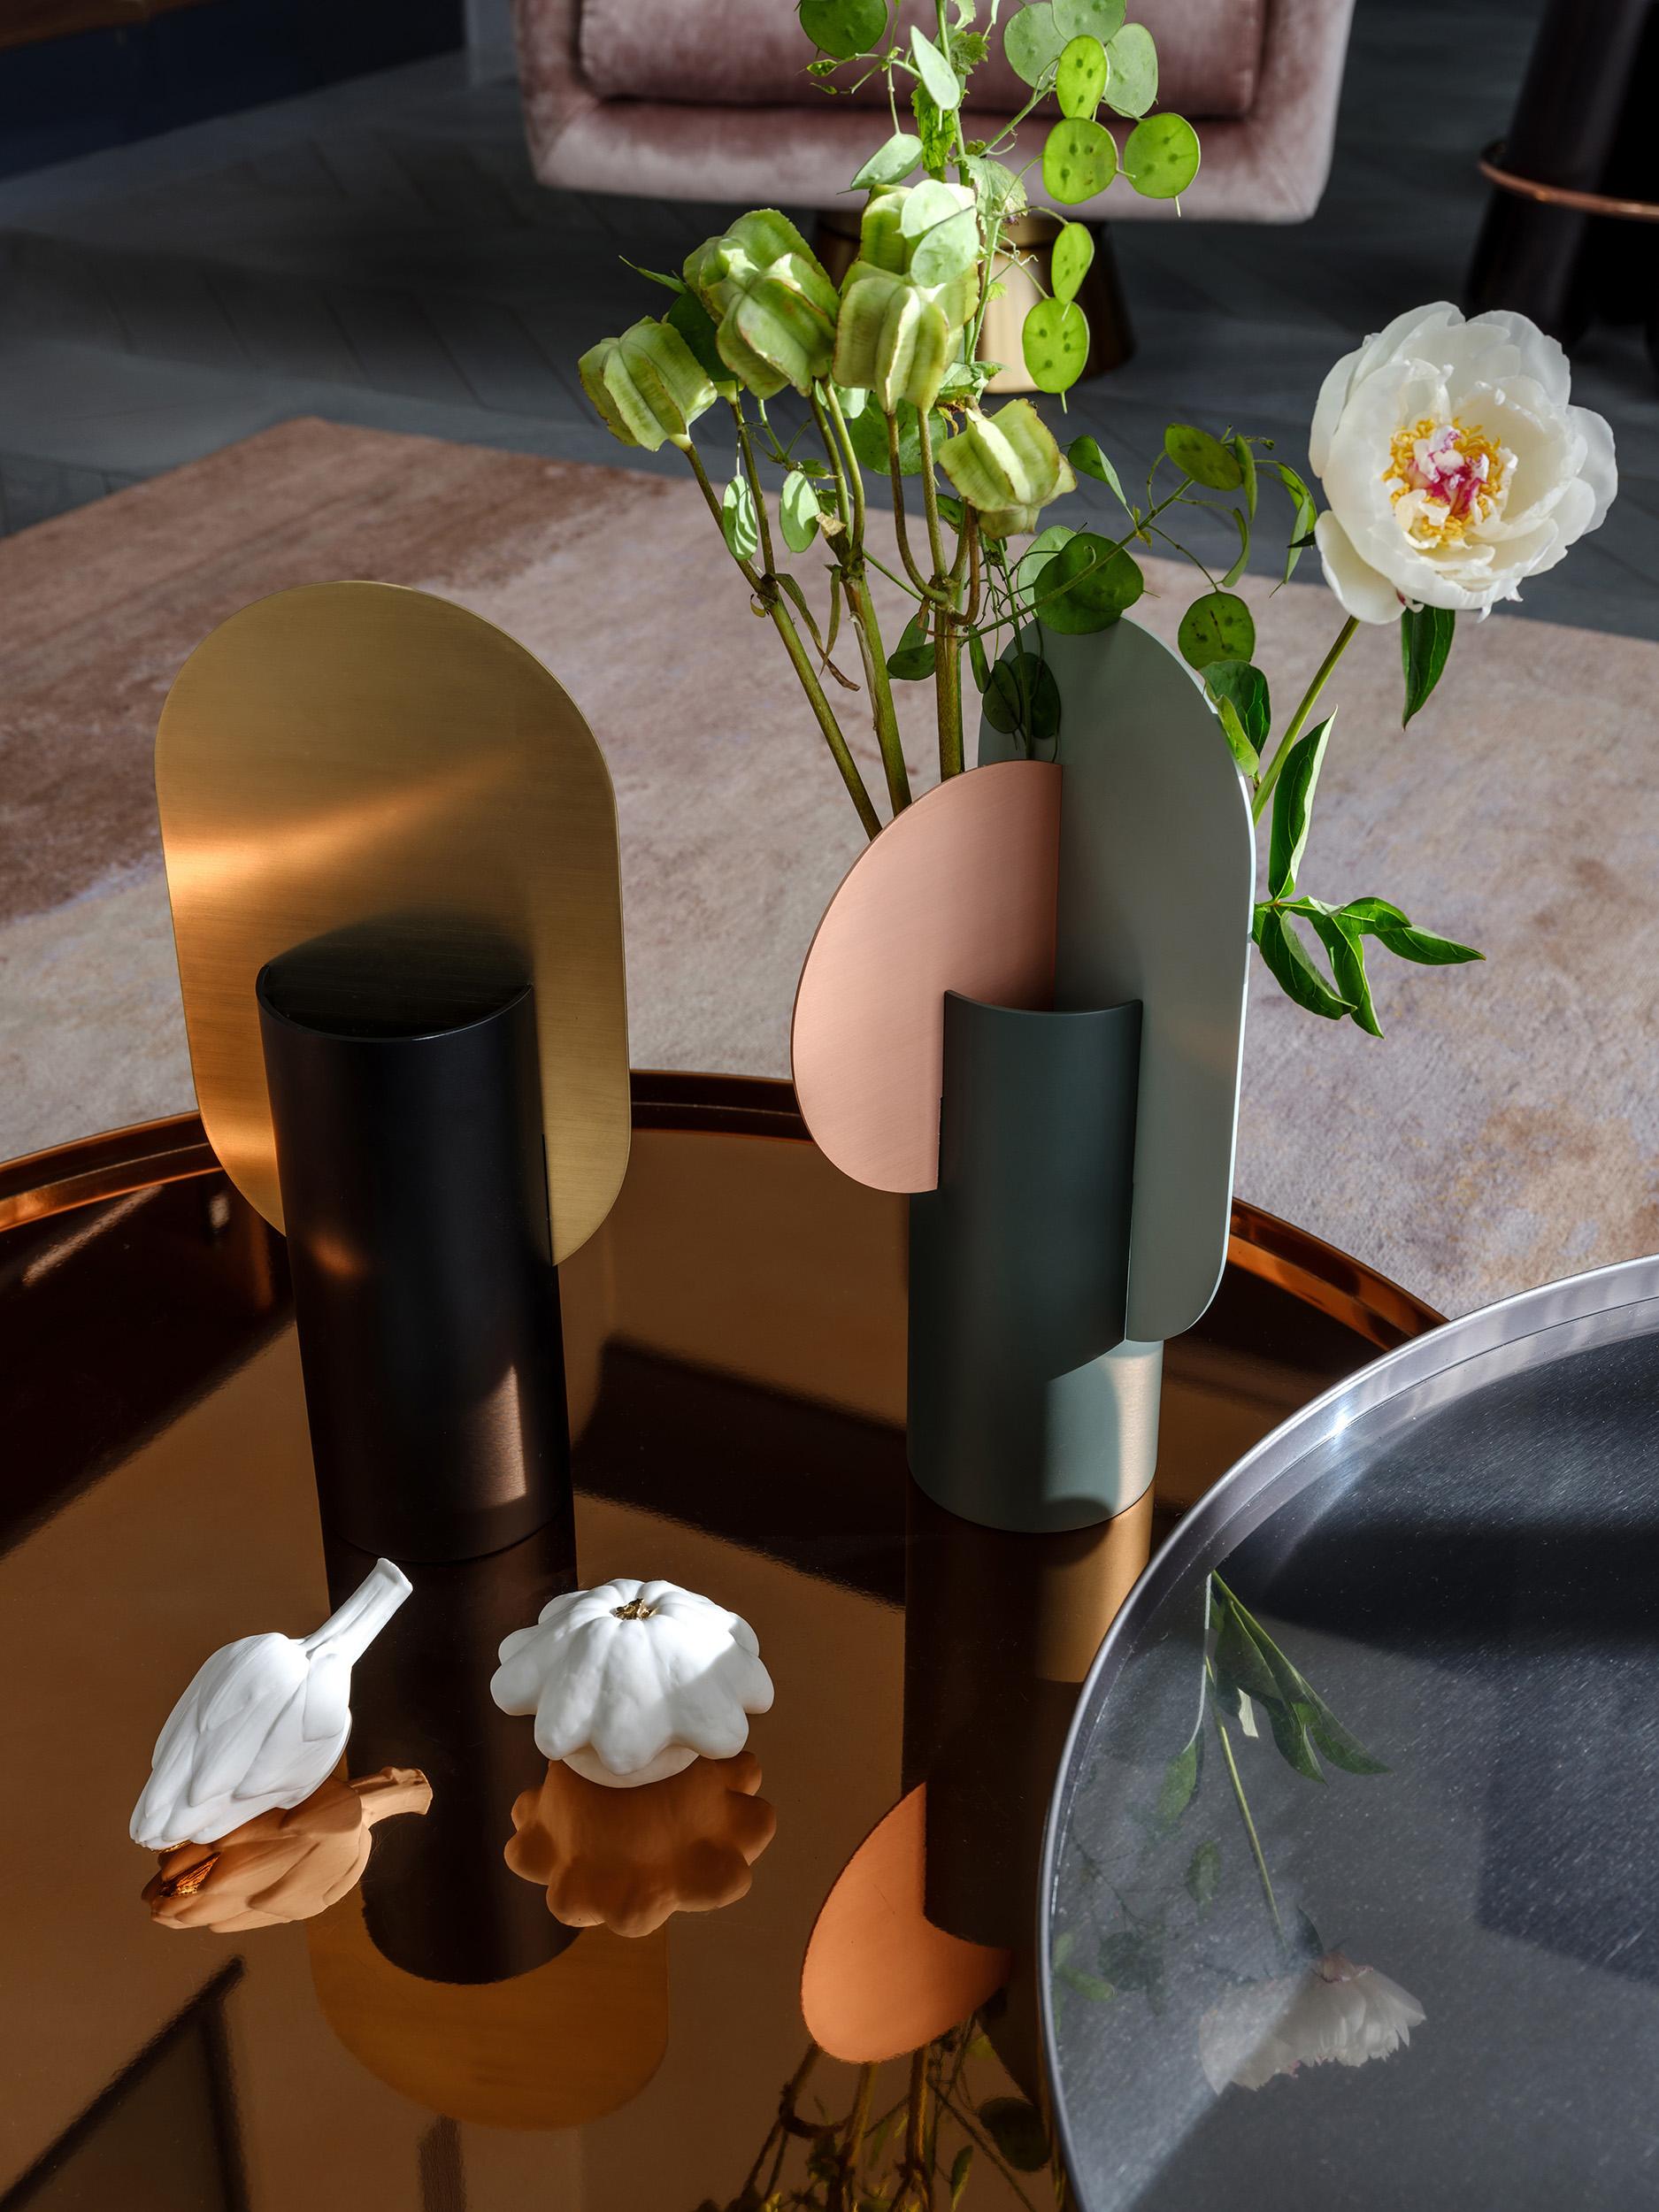 Noom vase in interior